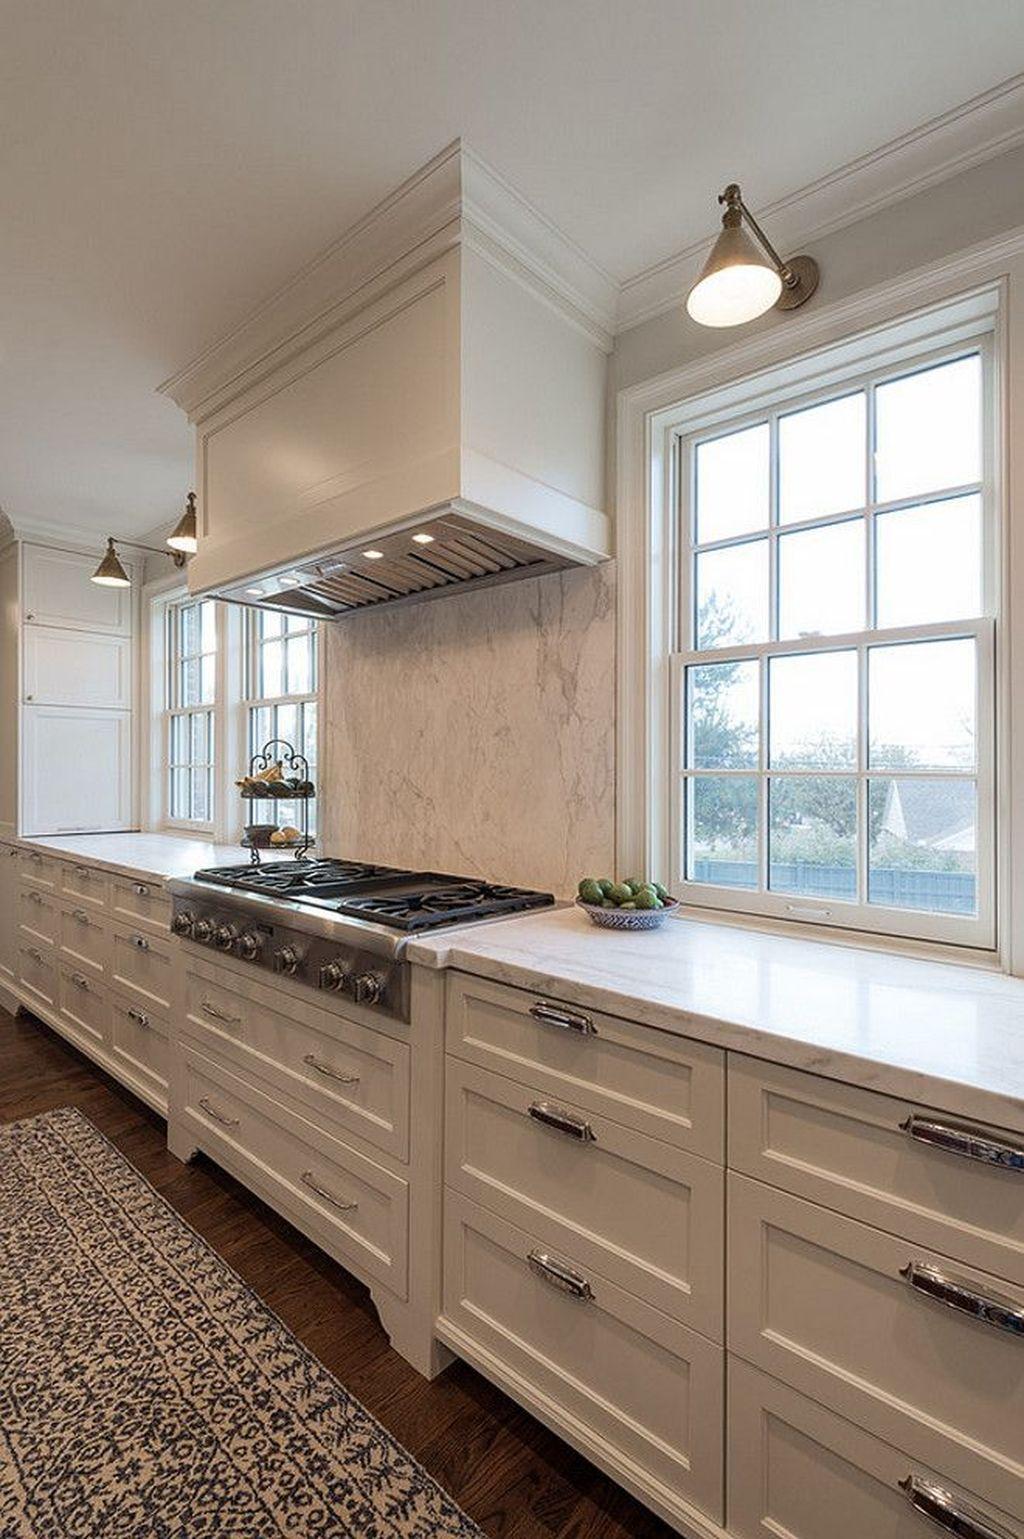 87 wonderful simple kitchen remodel ideas kitchen decor and design rh pinterest com